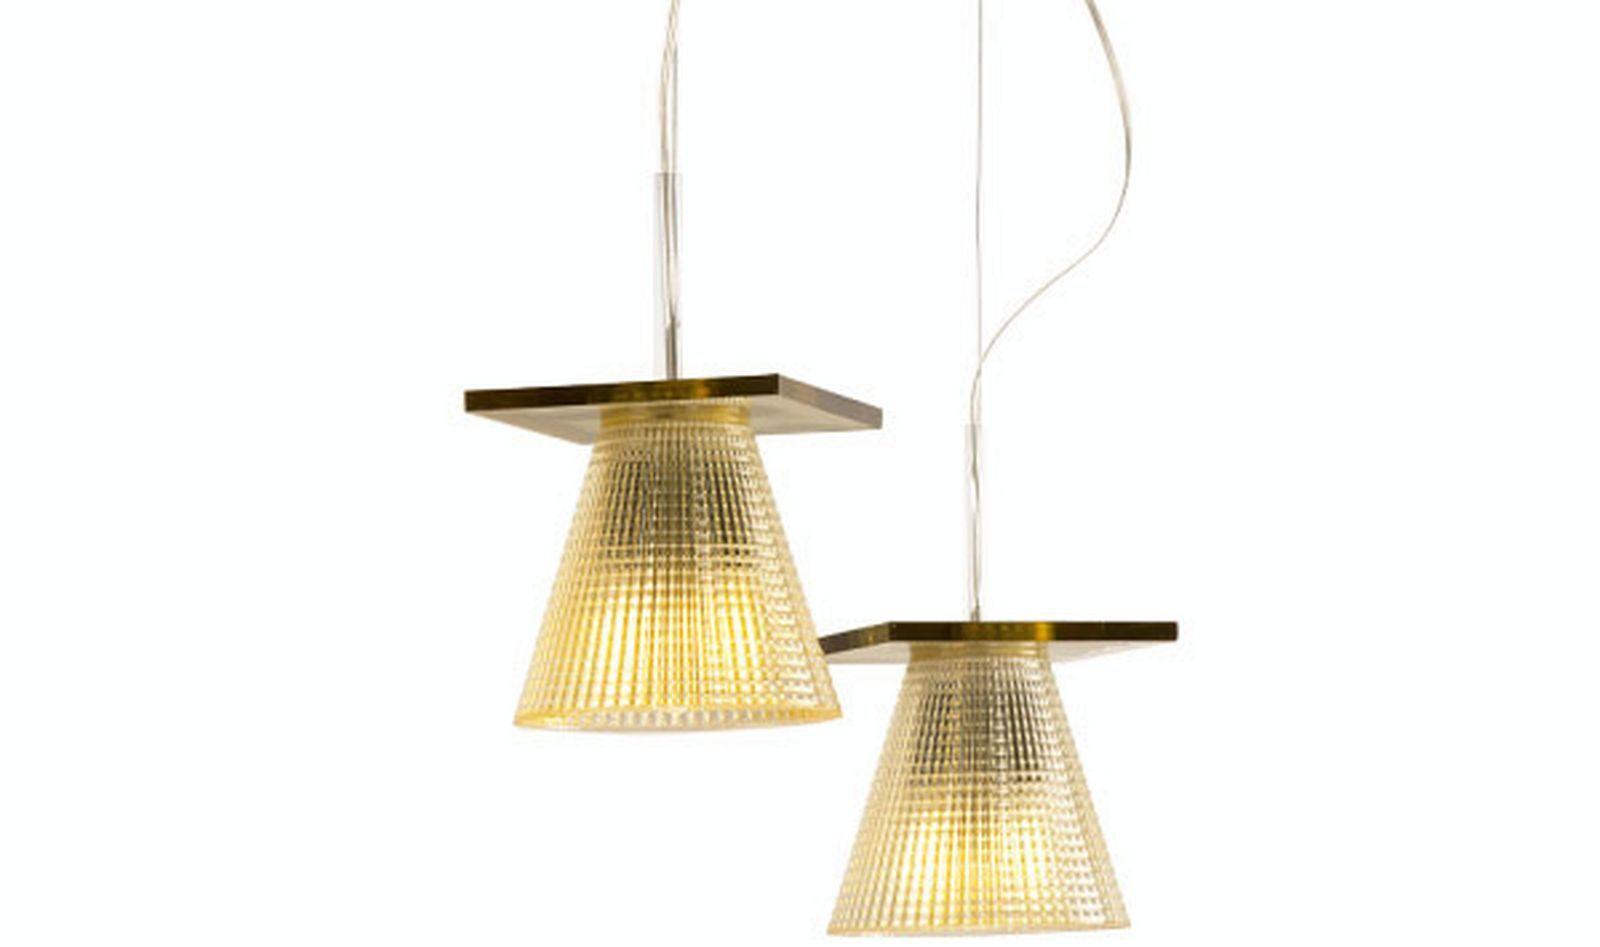 Kartell Light Air LED 9130   AM Bernstein Eugeni Quitllet Pendelleuchte